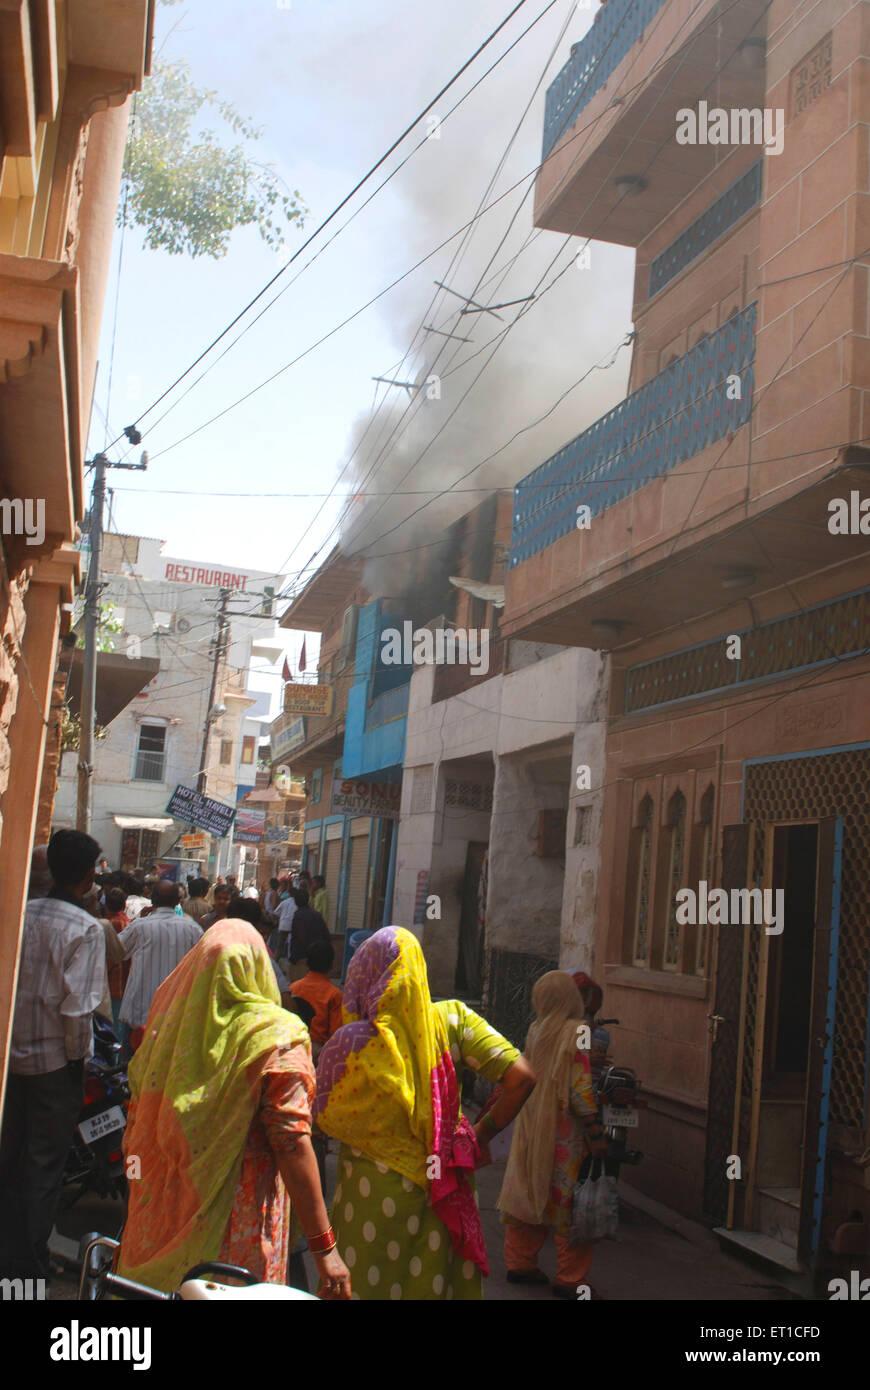 Observar a la gente víctima del fuego de casa en lane ; ; ; Rajasthan Jodhpur India Imagen De Stock